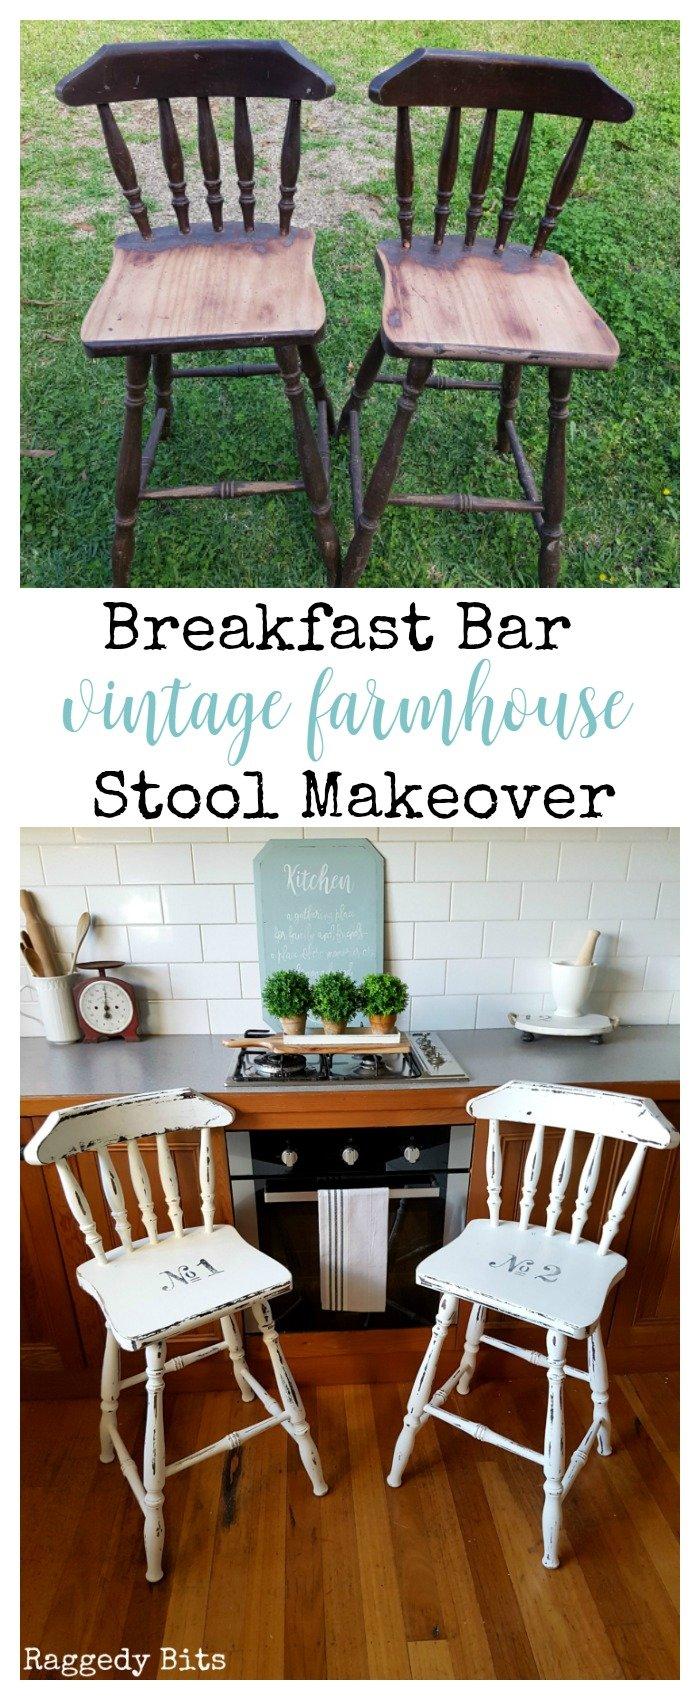 Breakfast Bar Vintage Farmhouse Stool Makeover Raggedy Bits : Breakfast Bar Vintage Farmhouse Stool Makeover PIN from raggedy-bits.com size 700 x 1700 jpeg 345kB